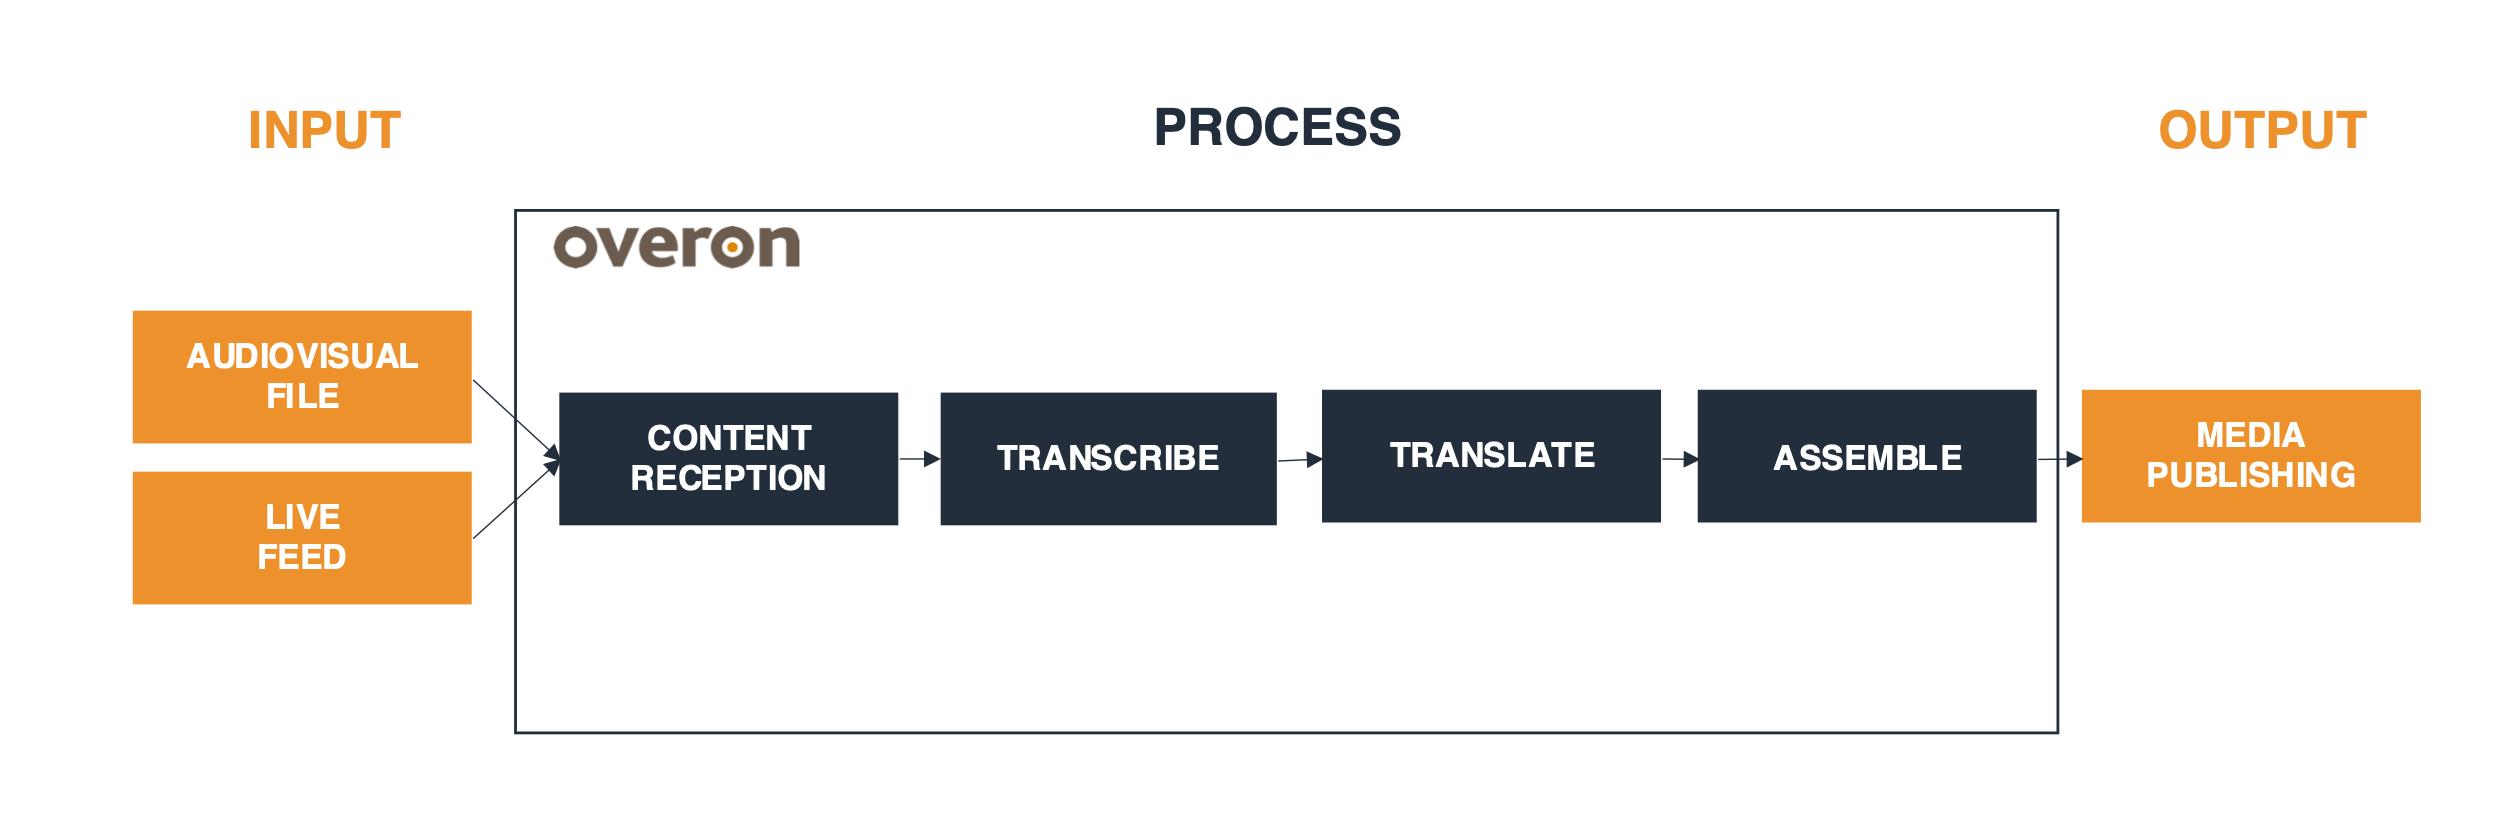 Figure 3. Multi-language content distribution